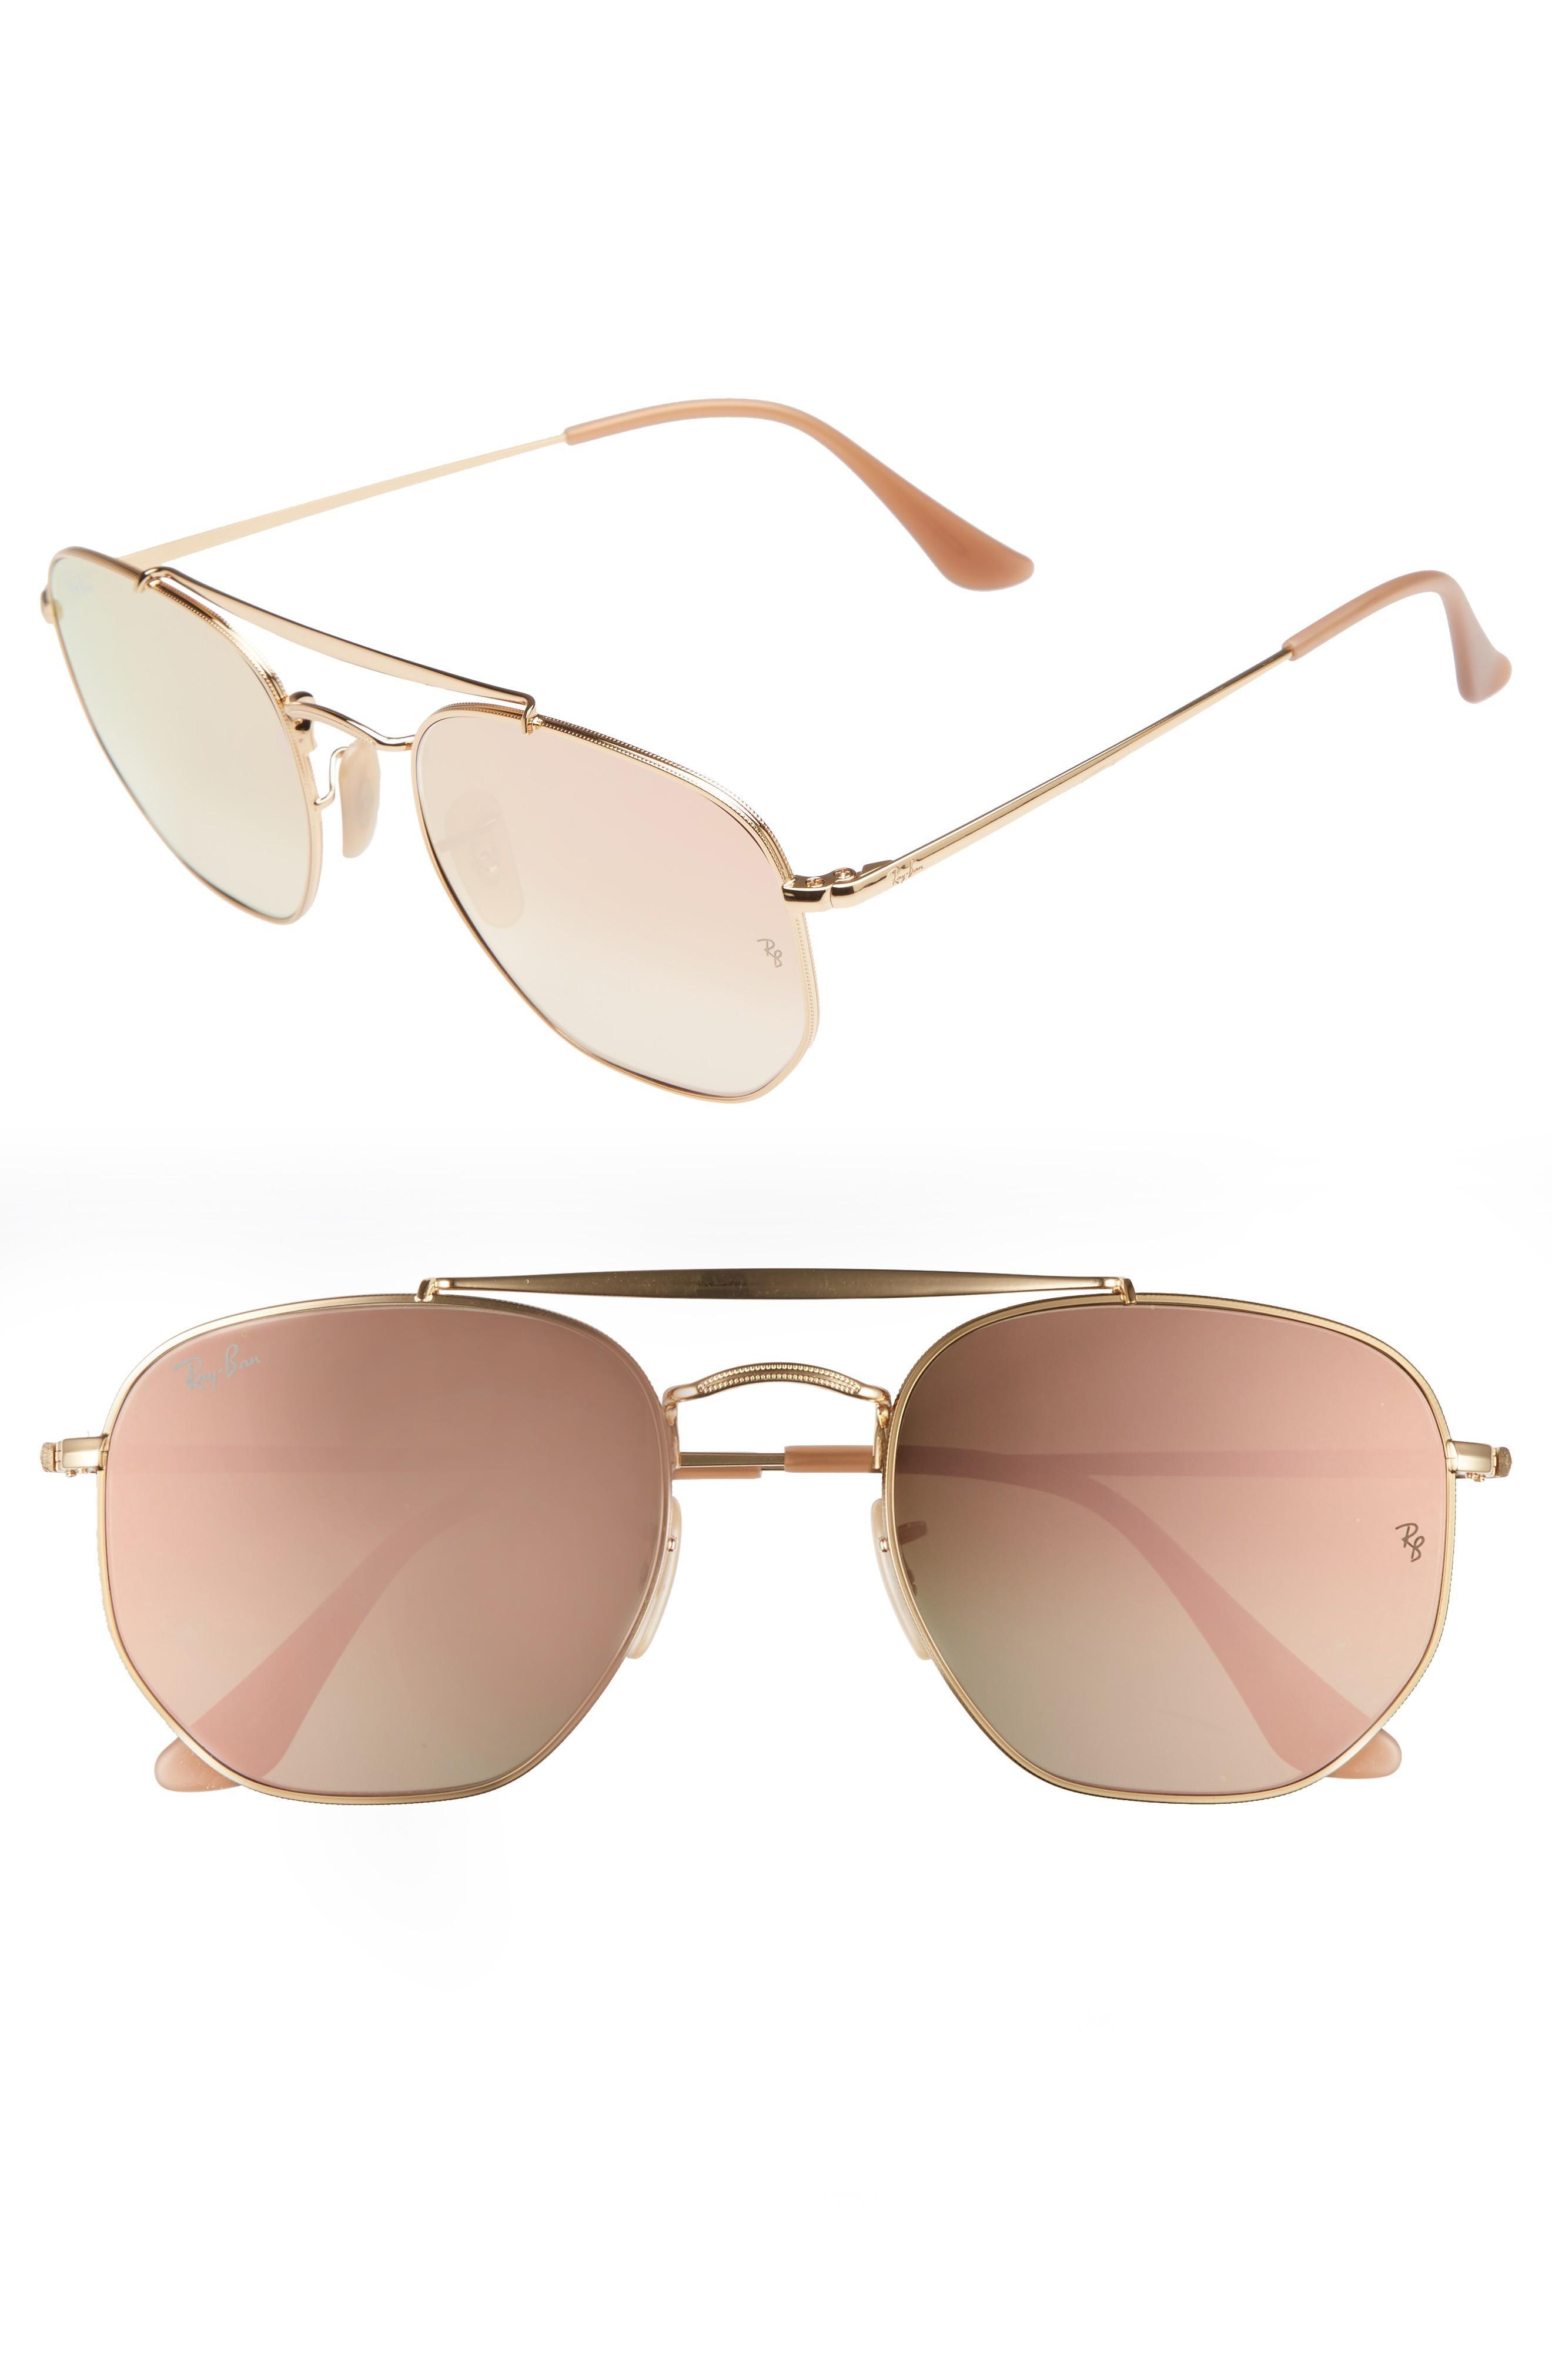 648bca6d55 Ray Ban Marshal 54Mm Aviator Sunglasses - Gold  Pink